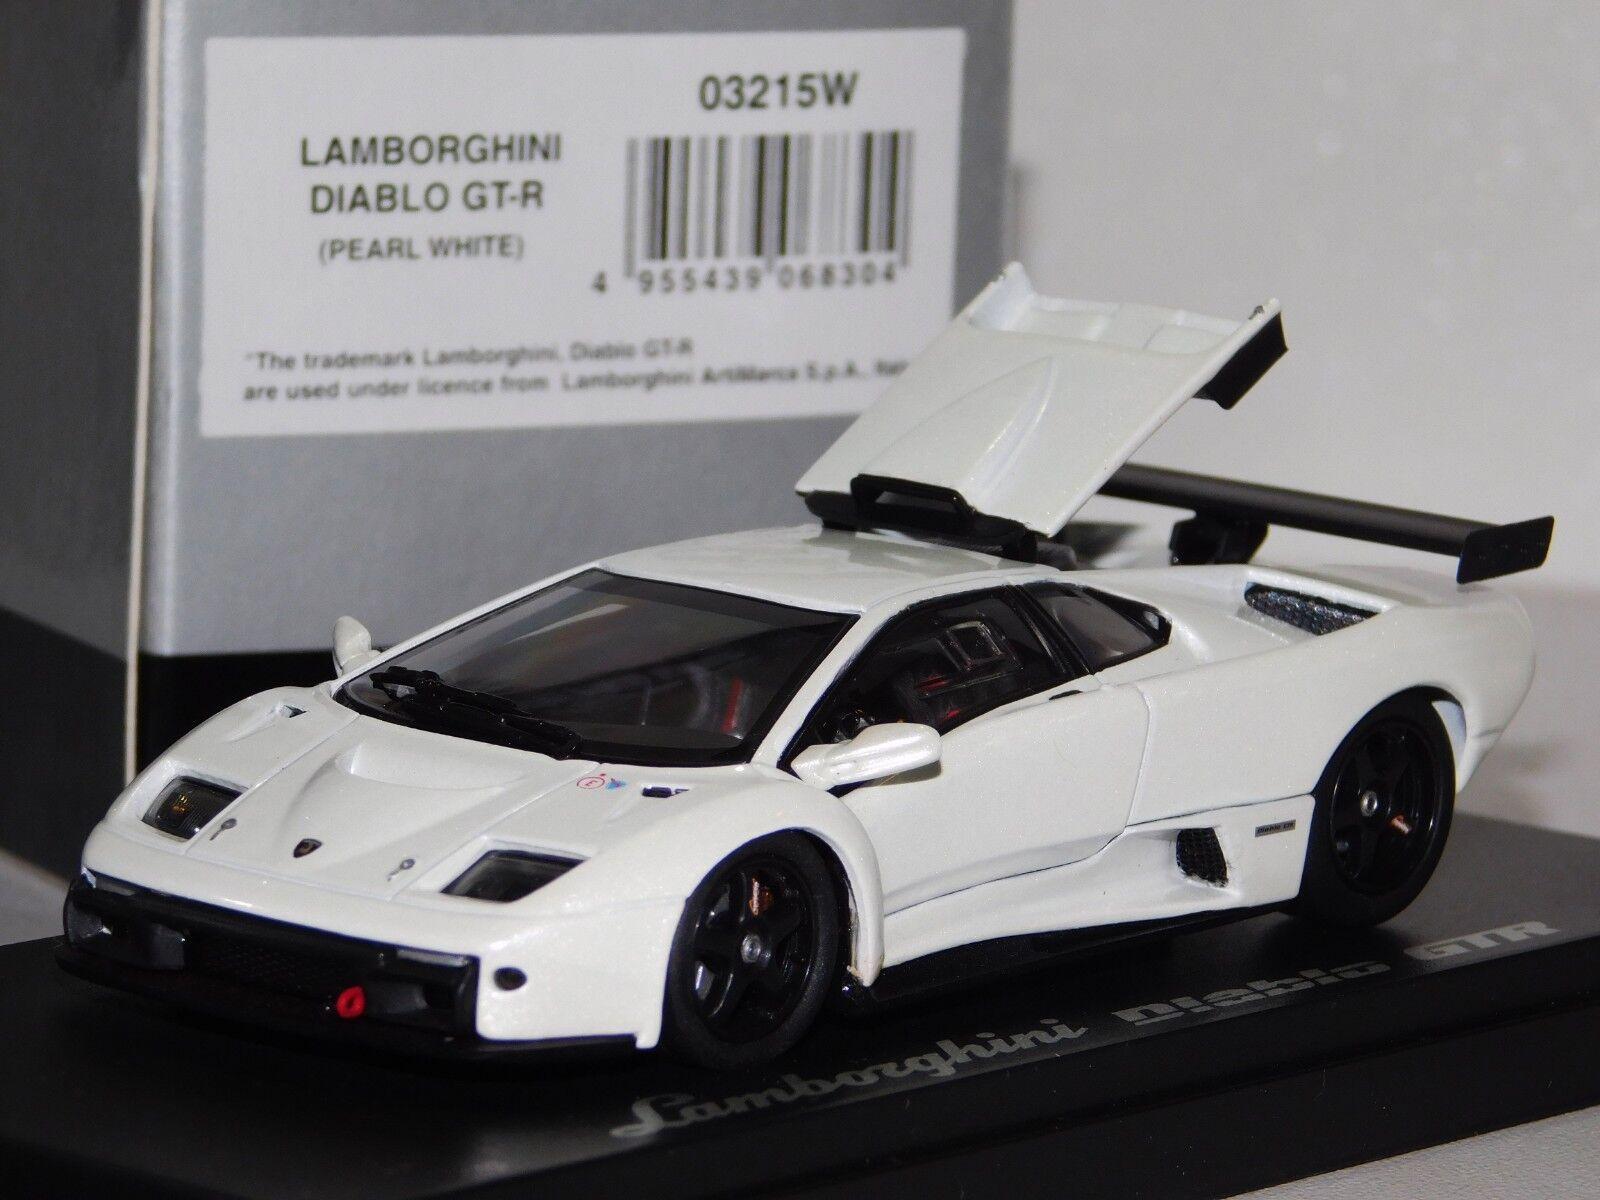 LAMBORGHINI DIABLO GTR PEARL Weiß KYOSHO  03215W 1 43